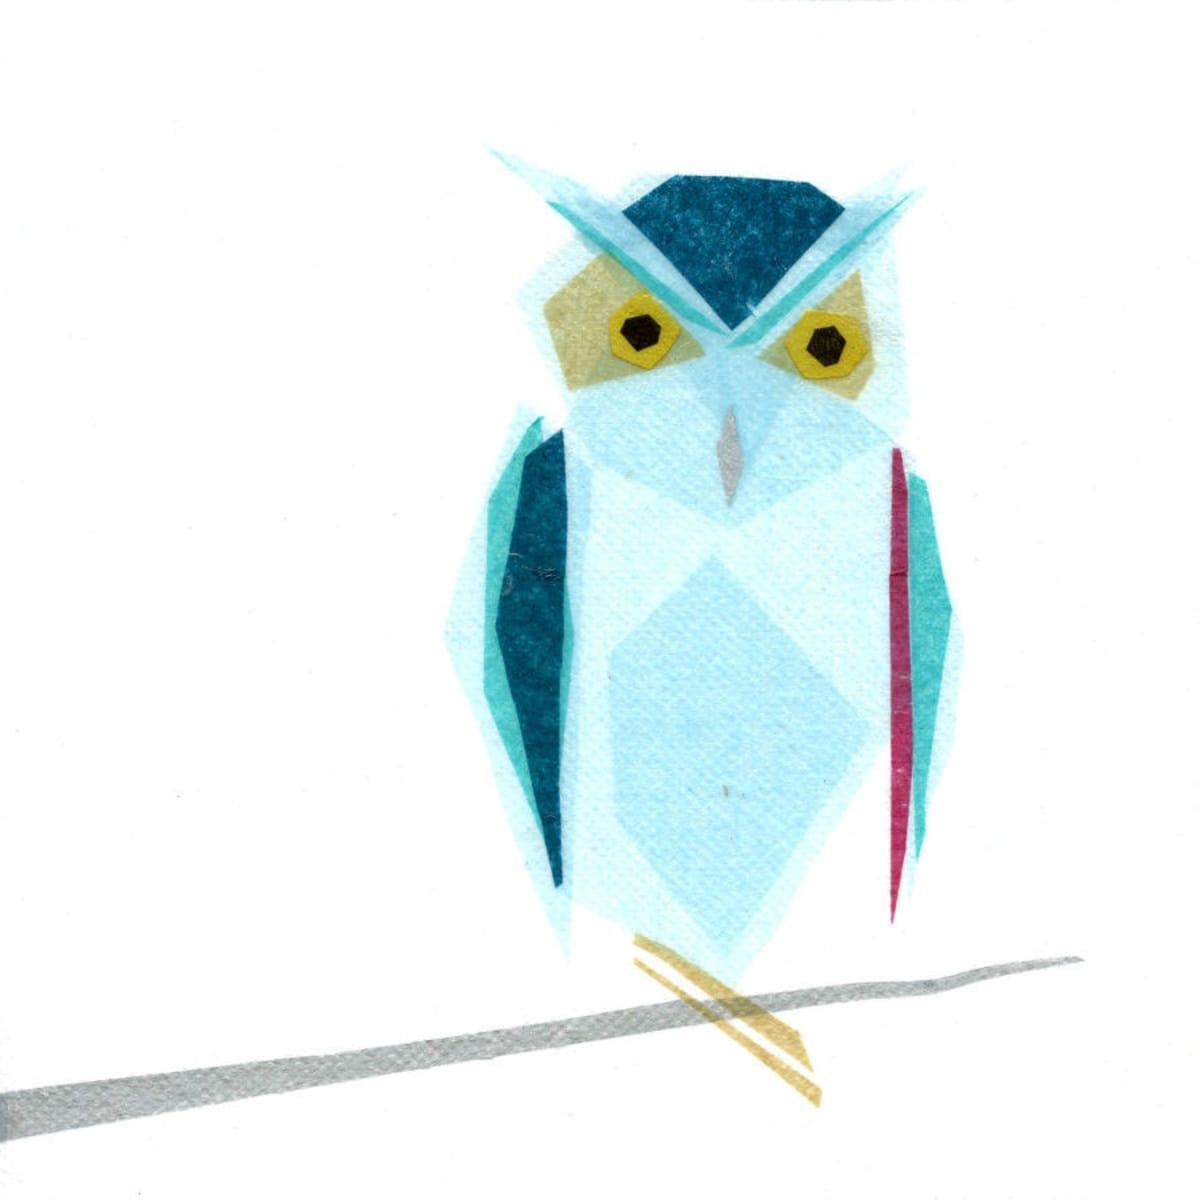 Tiny Fawn Omar Owl print at West Elm